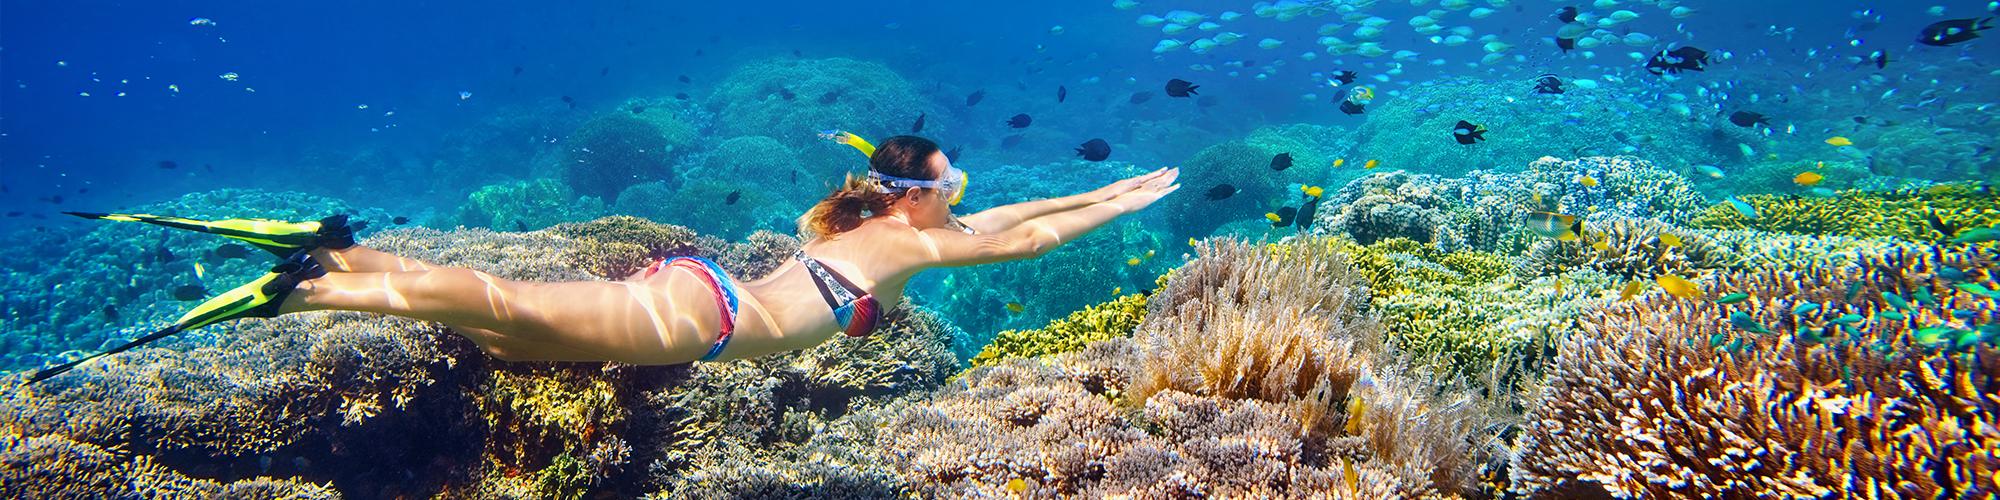 Marsa AlamSnorkeling Trips - Snorkeling Trips From Marsa Alam - Tours From Hurghada